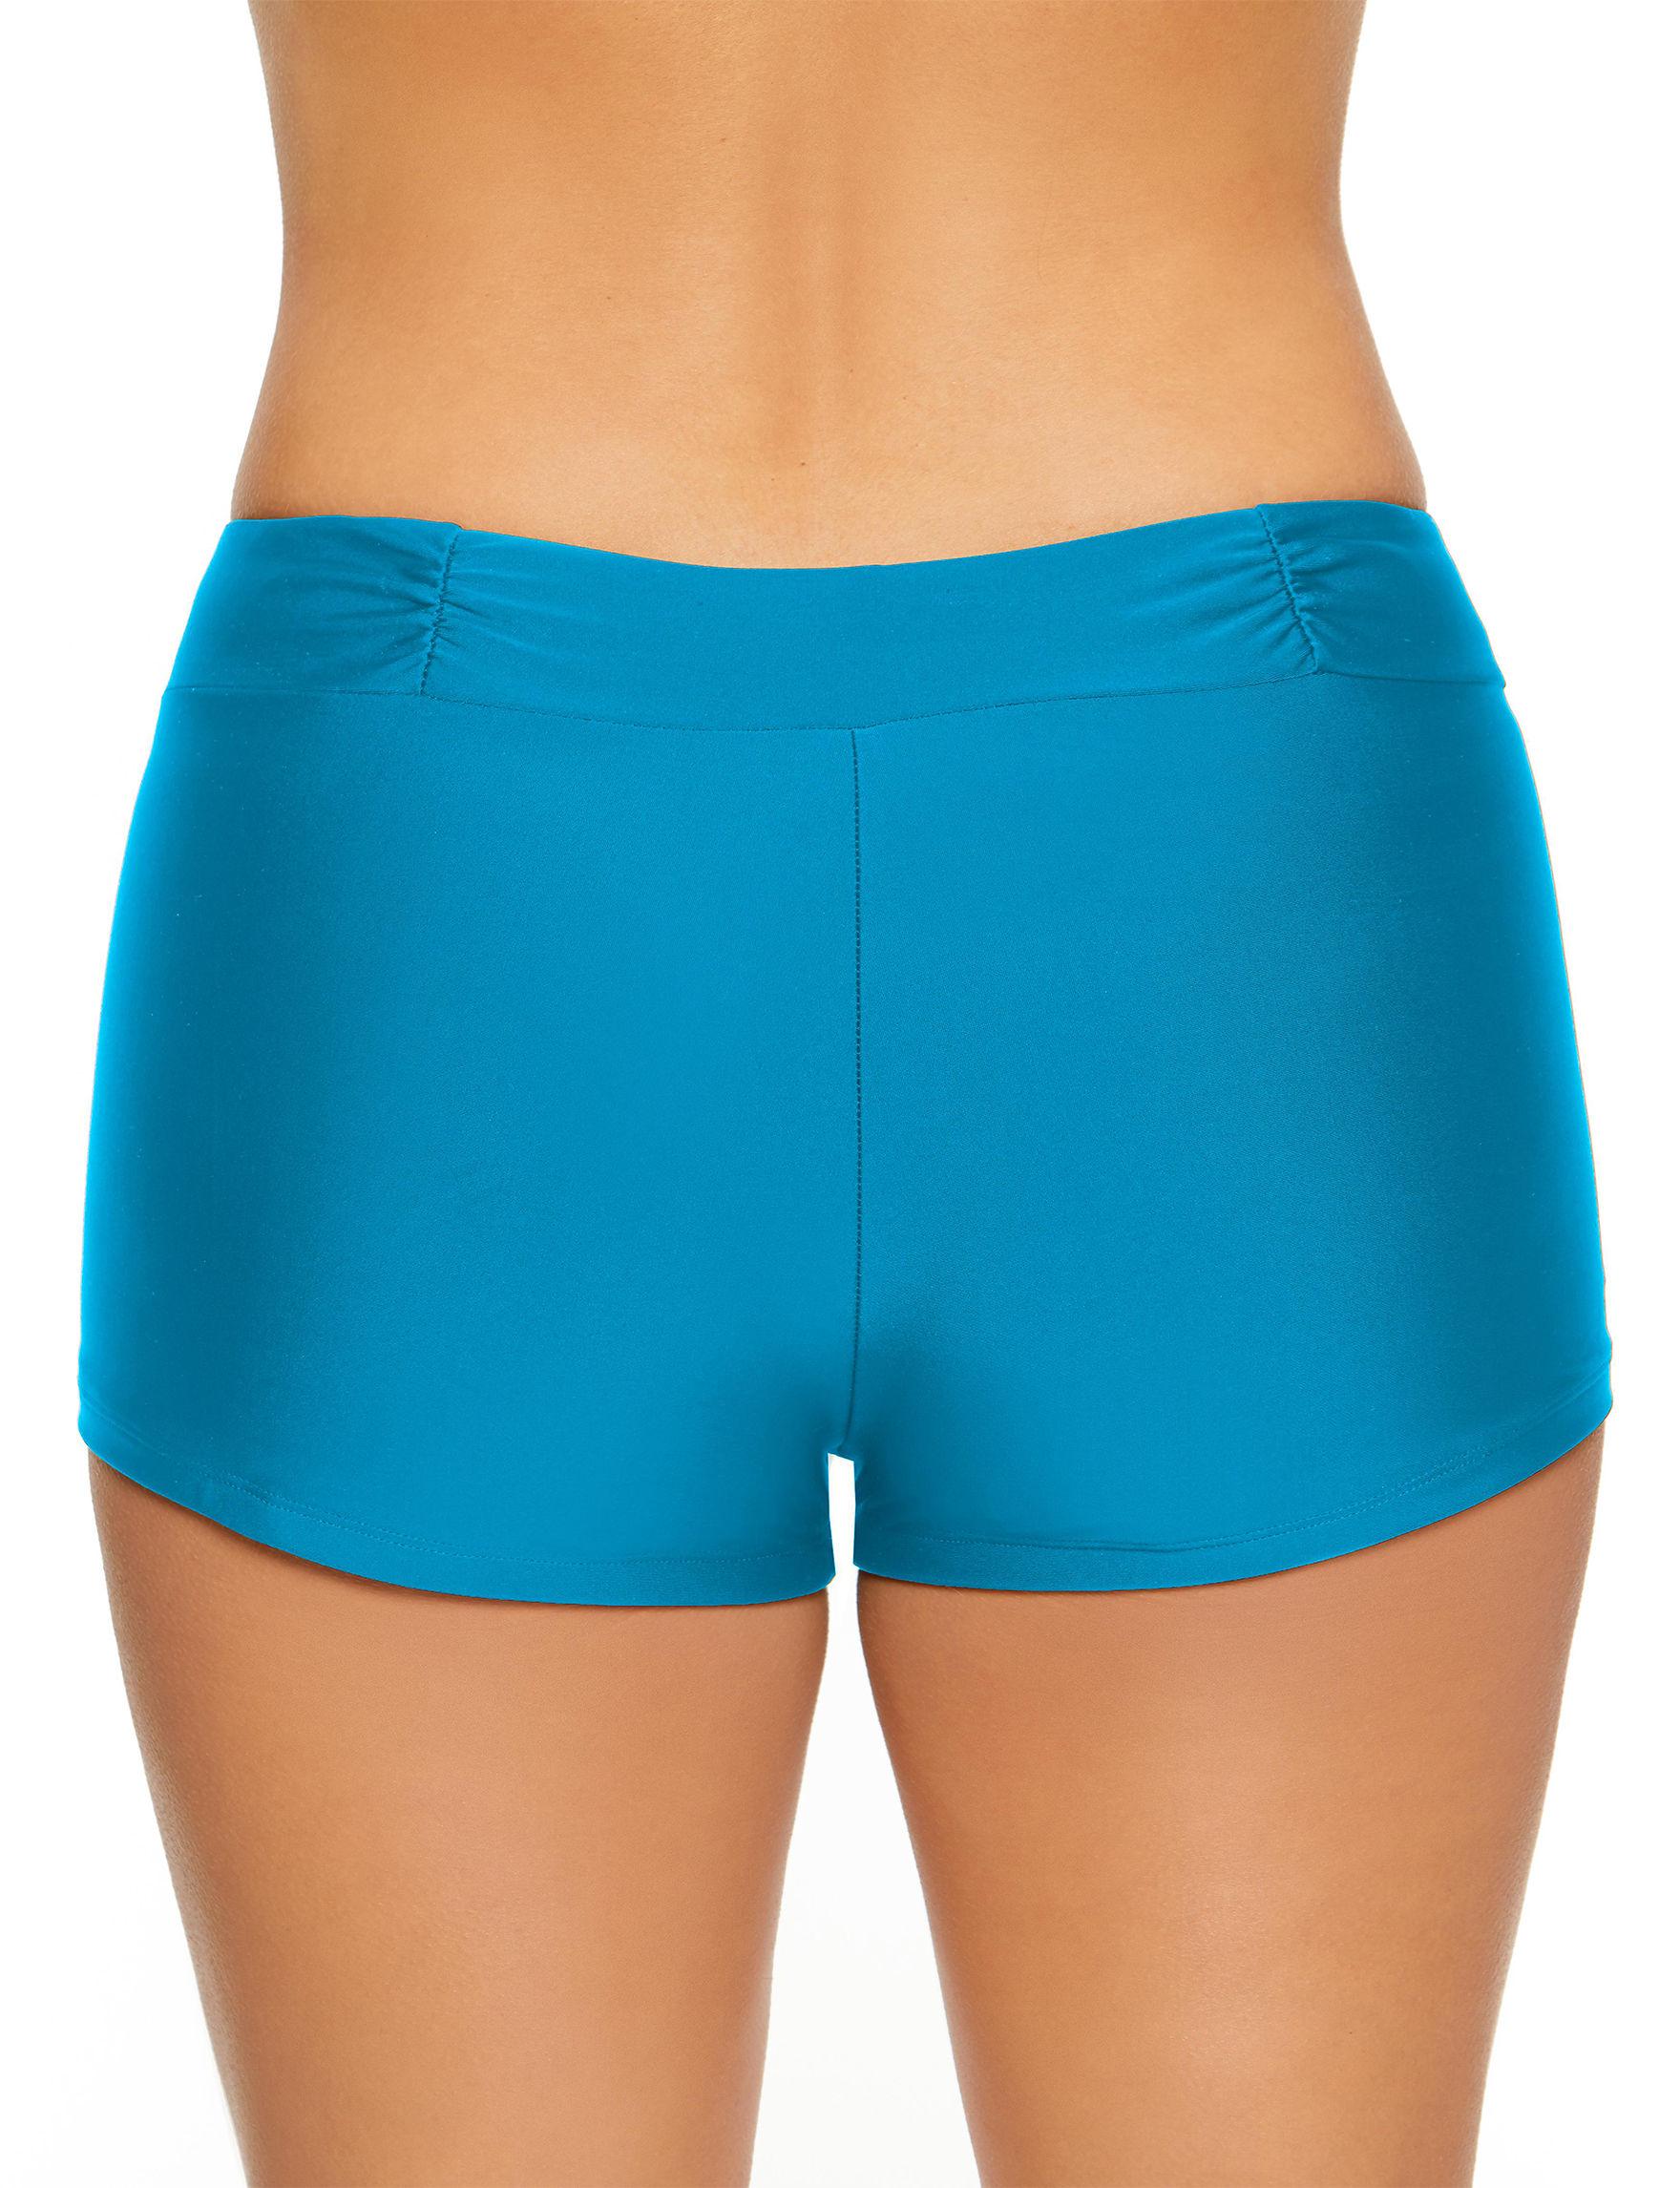 93aaad3bd4 Aqua Couture Women's Malibu Boy Shorts Swim Bottoms. WEB ID #:573555.  product. product. product. product